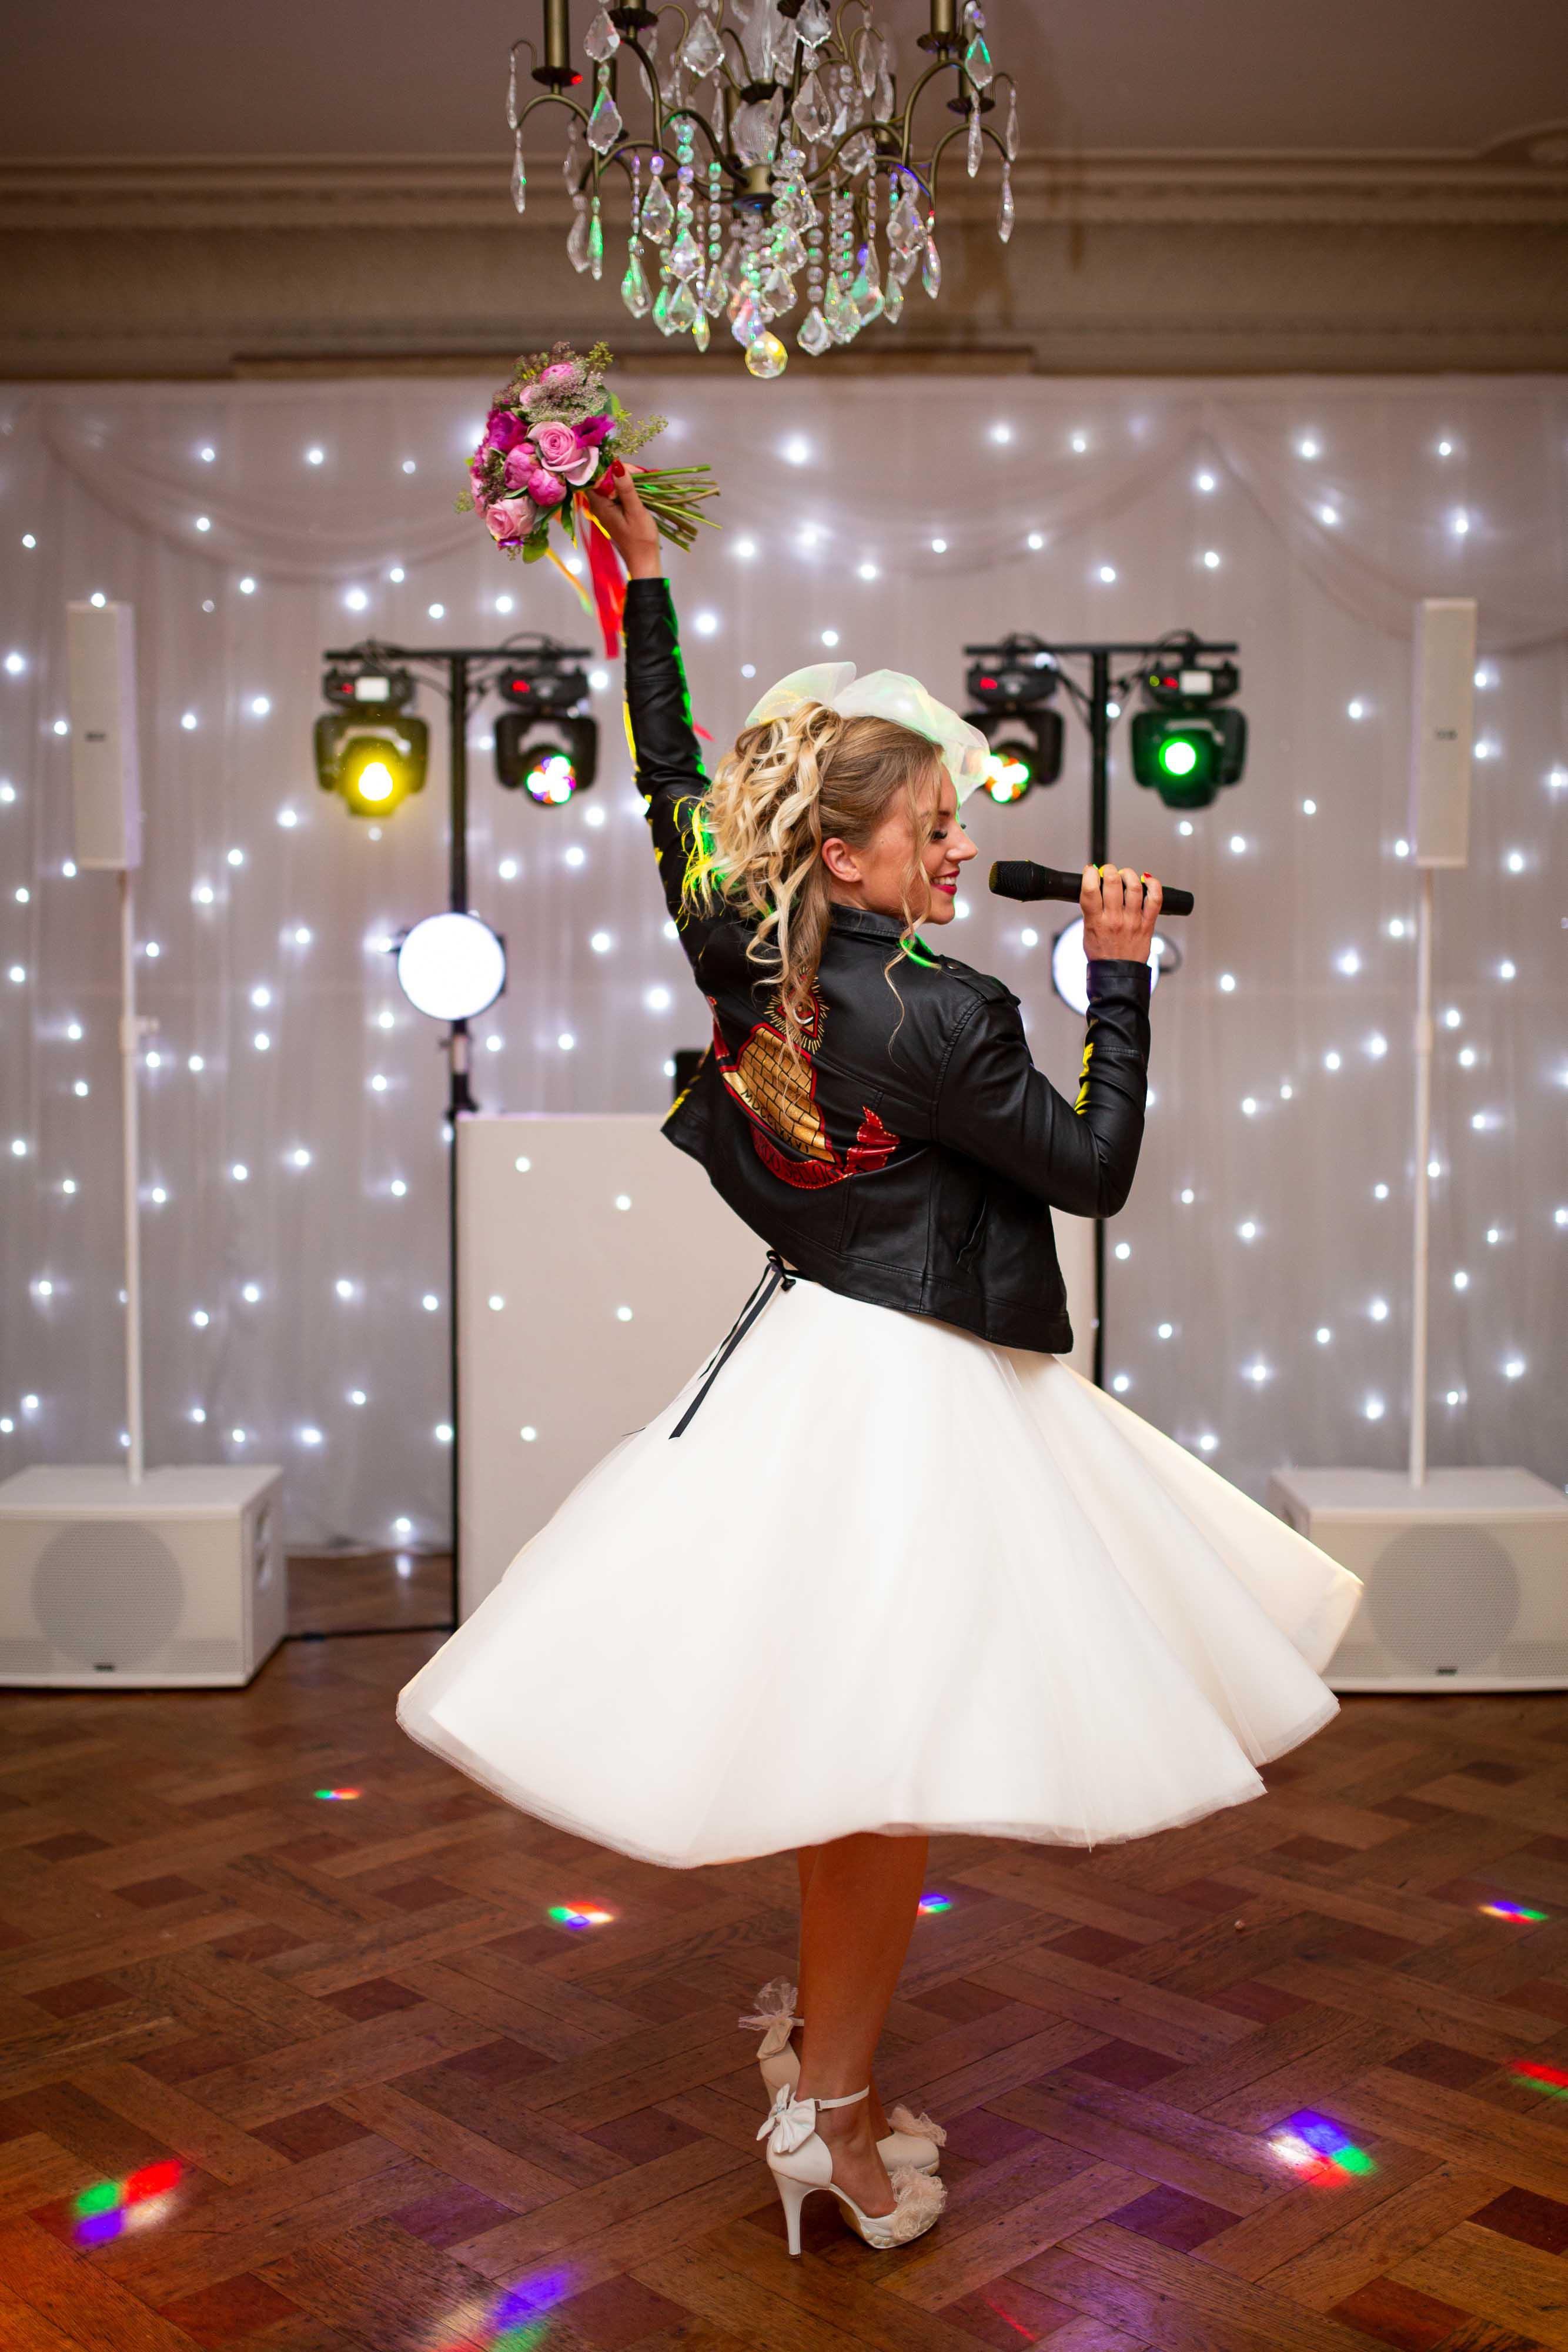 iconic wedding looks- music themed wedding- unconventional wedding- alternative wedding- music lovers wedding- retro weding dress- madonna wedding dress